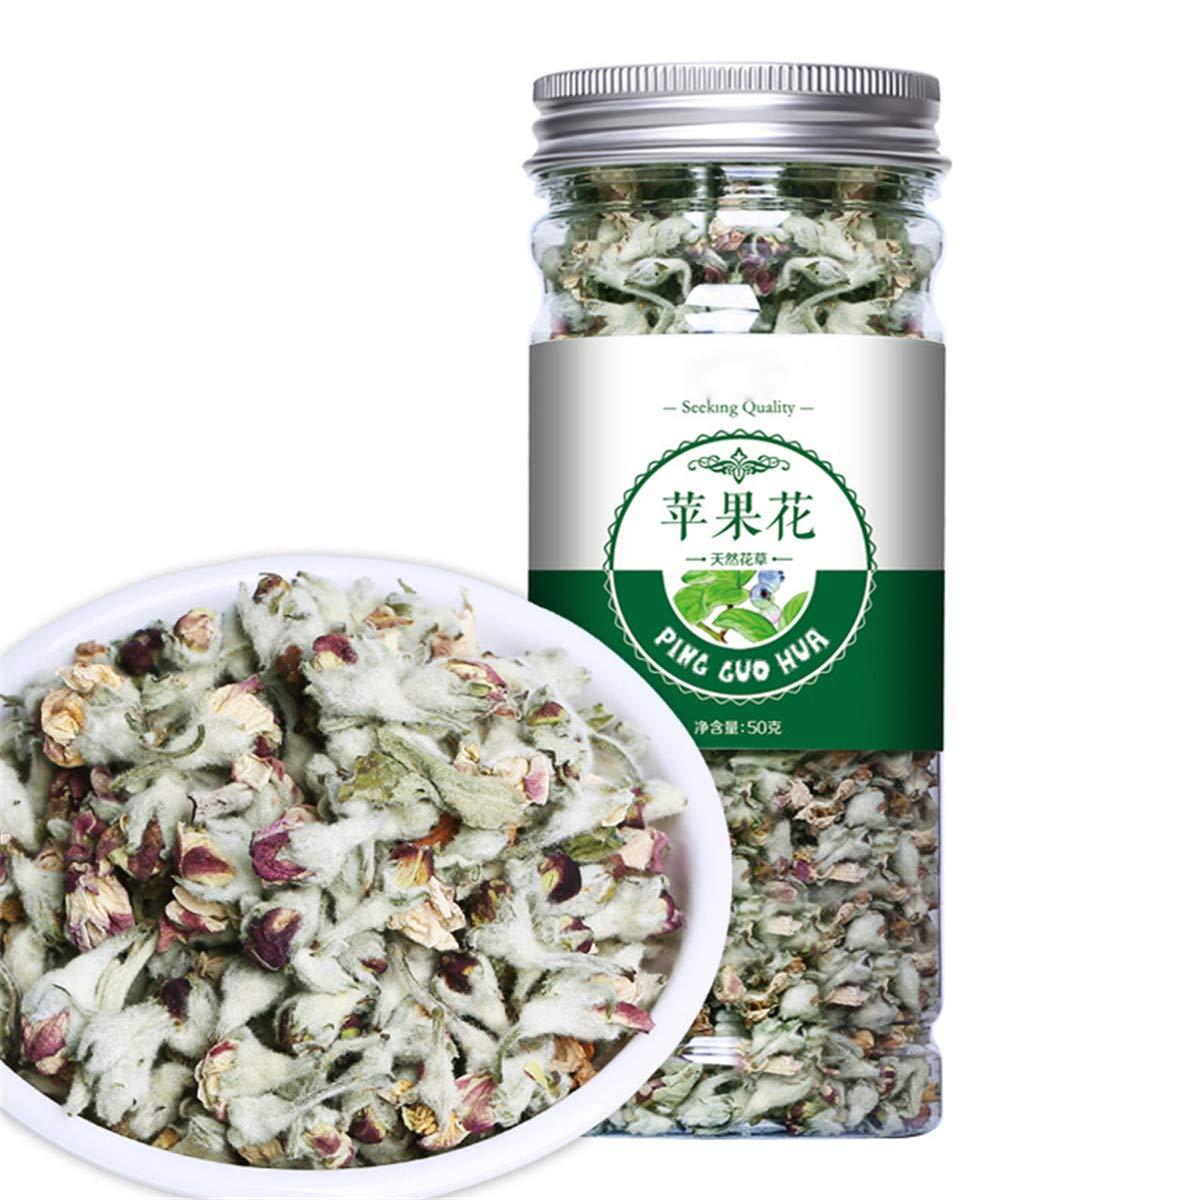 Chinese Herbal Tea Flower Fruit Tea Rose Tea Canned Golden Silk Chrysanthemum Bottled New Scented Tea Flowers Tea Green fat loss tea(50g Apple Blossom)